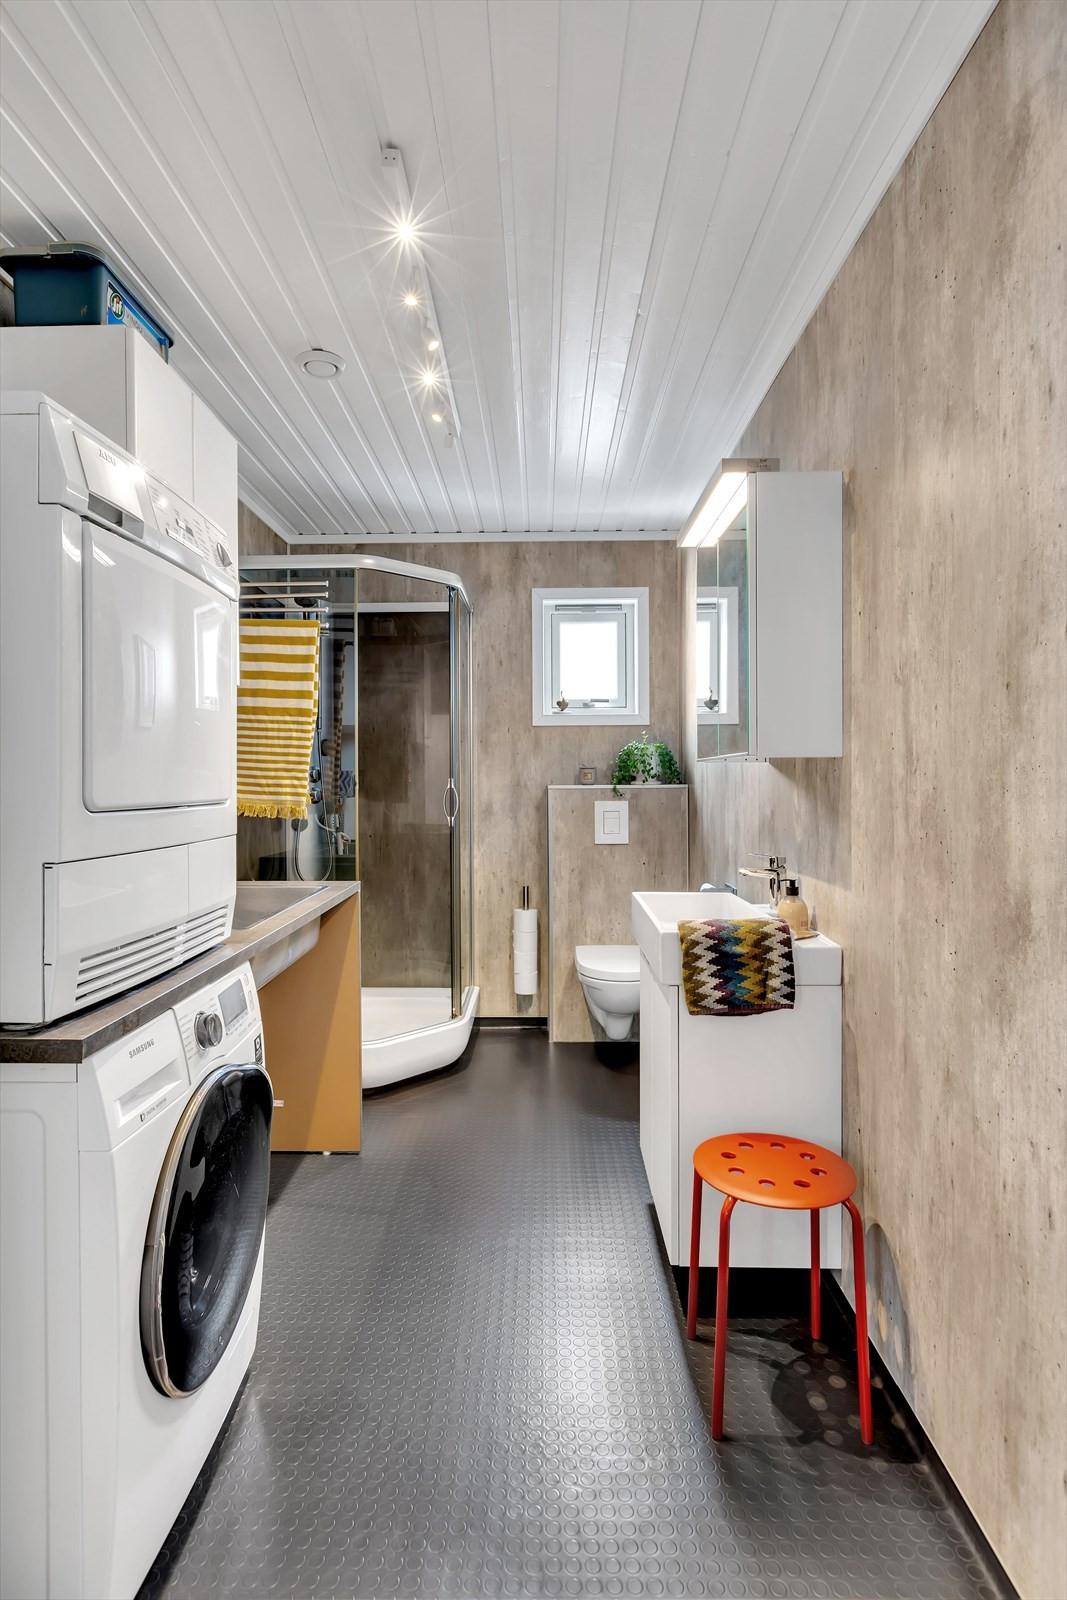 I 1. etasje finner du dette meget praktiske bad/wc/vaskerommet